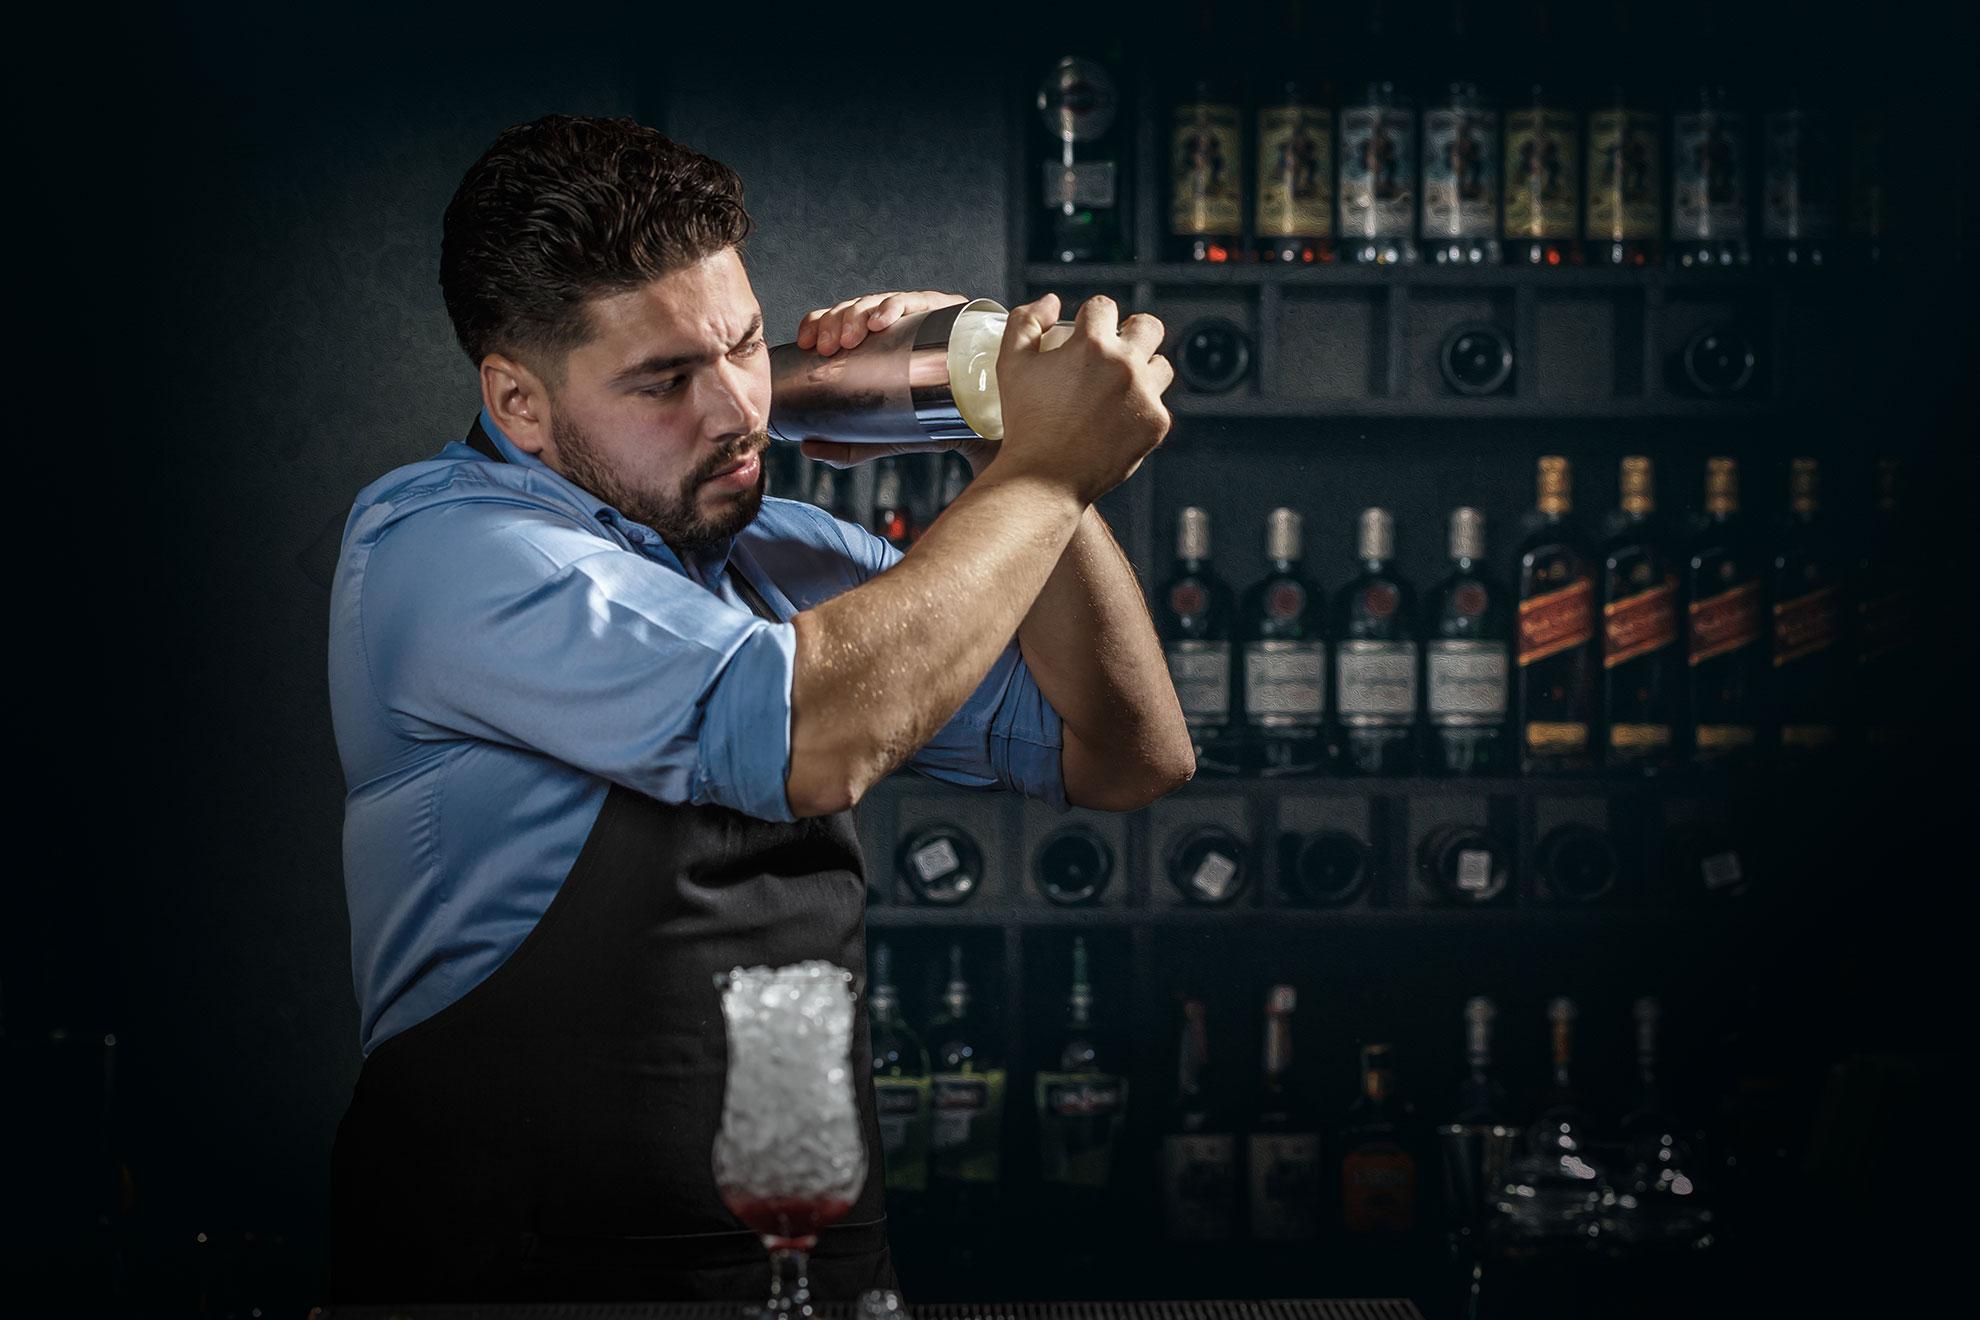 Barman podczas pracy